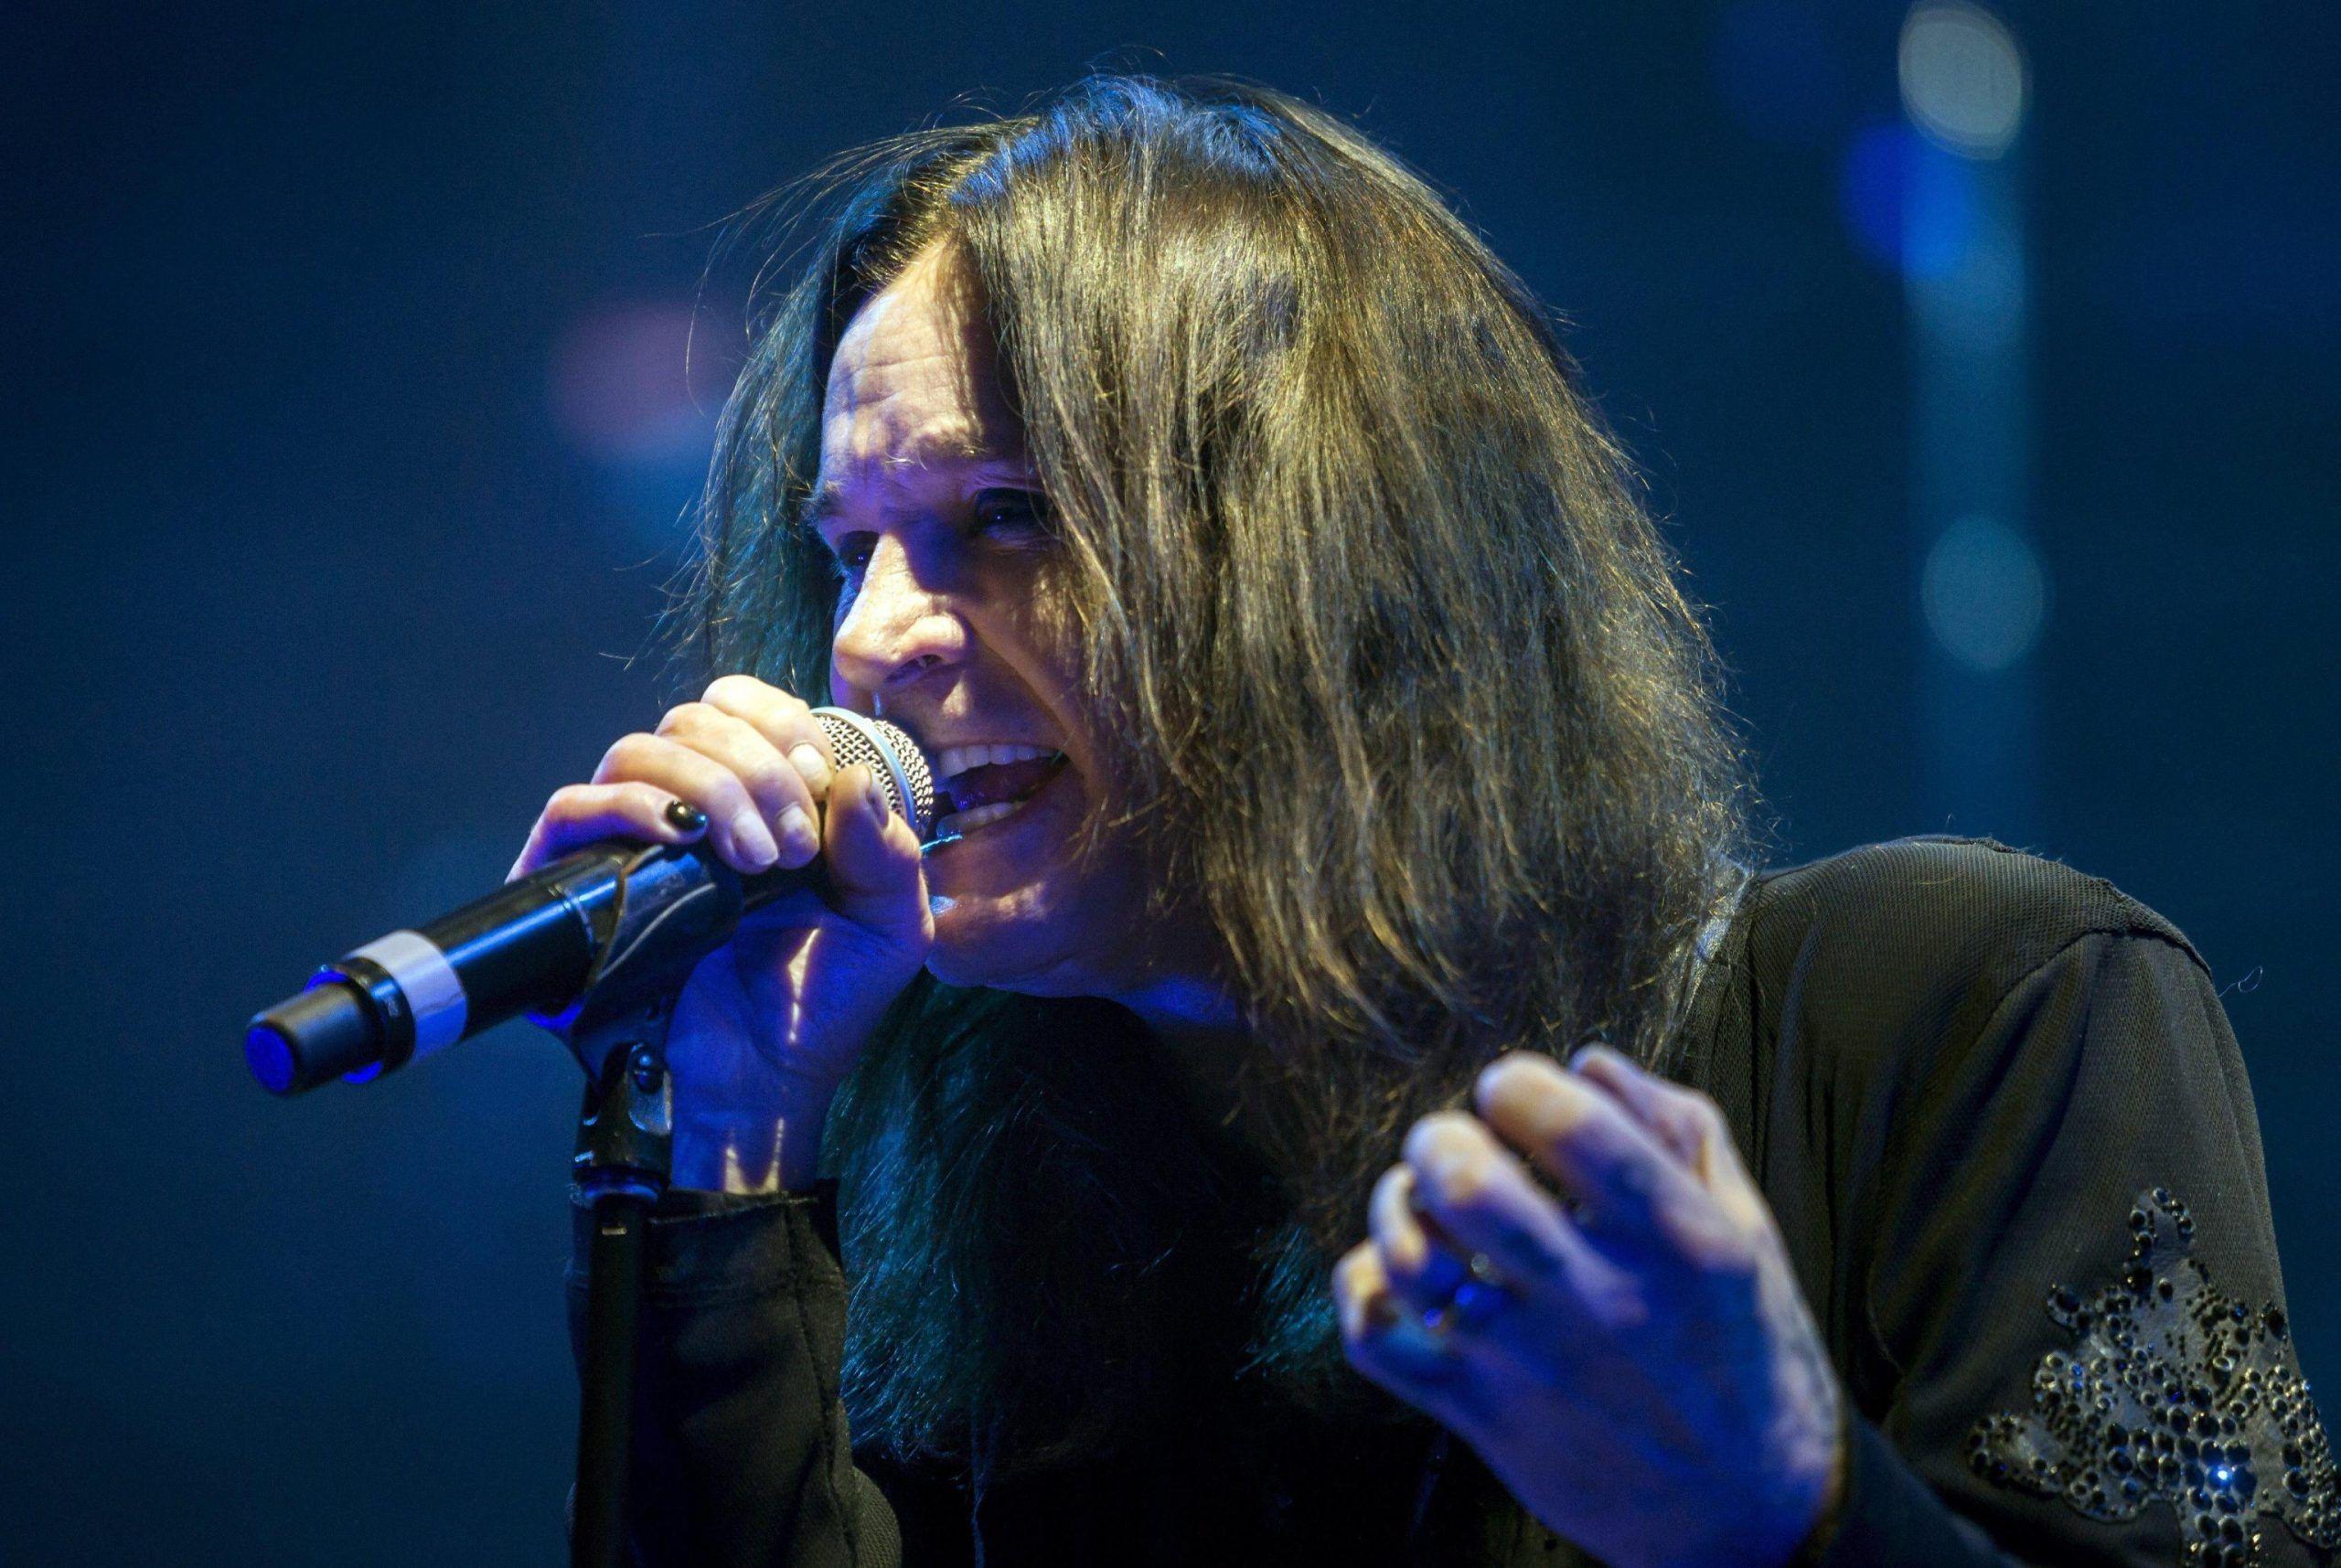 Ozzy Osbourne malato, rimandato il tour europeo compresa la data italiana: 'Sono devastato'